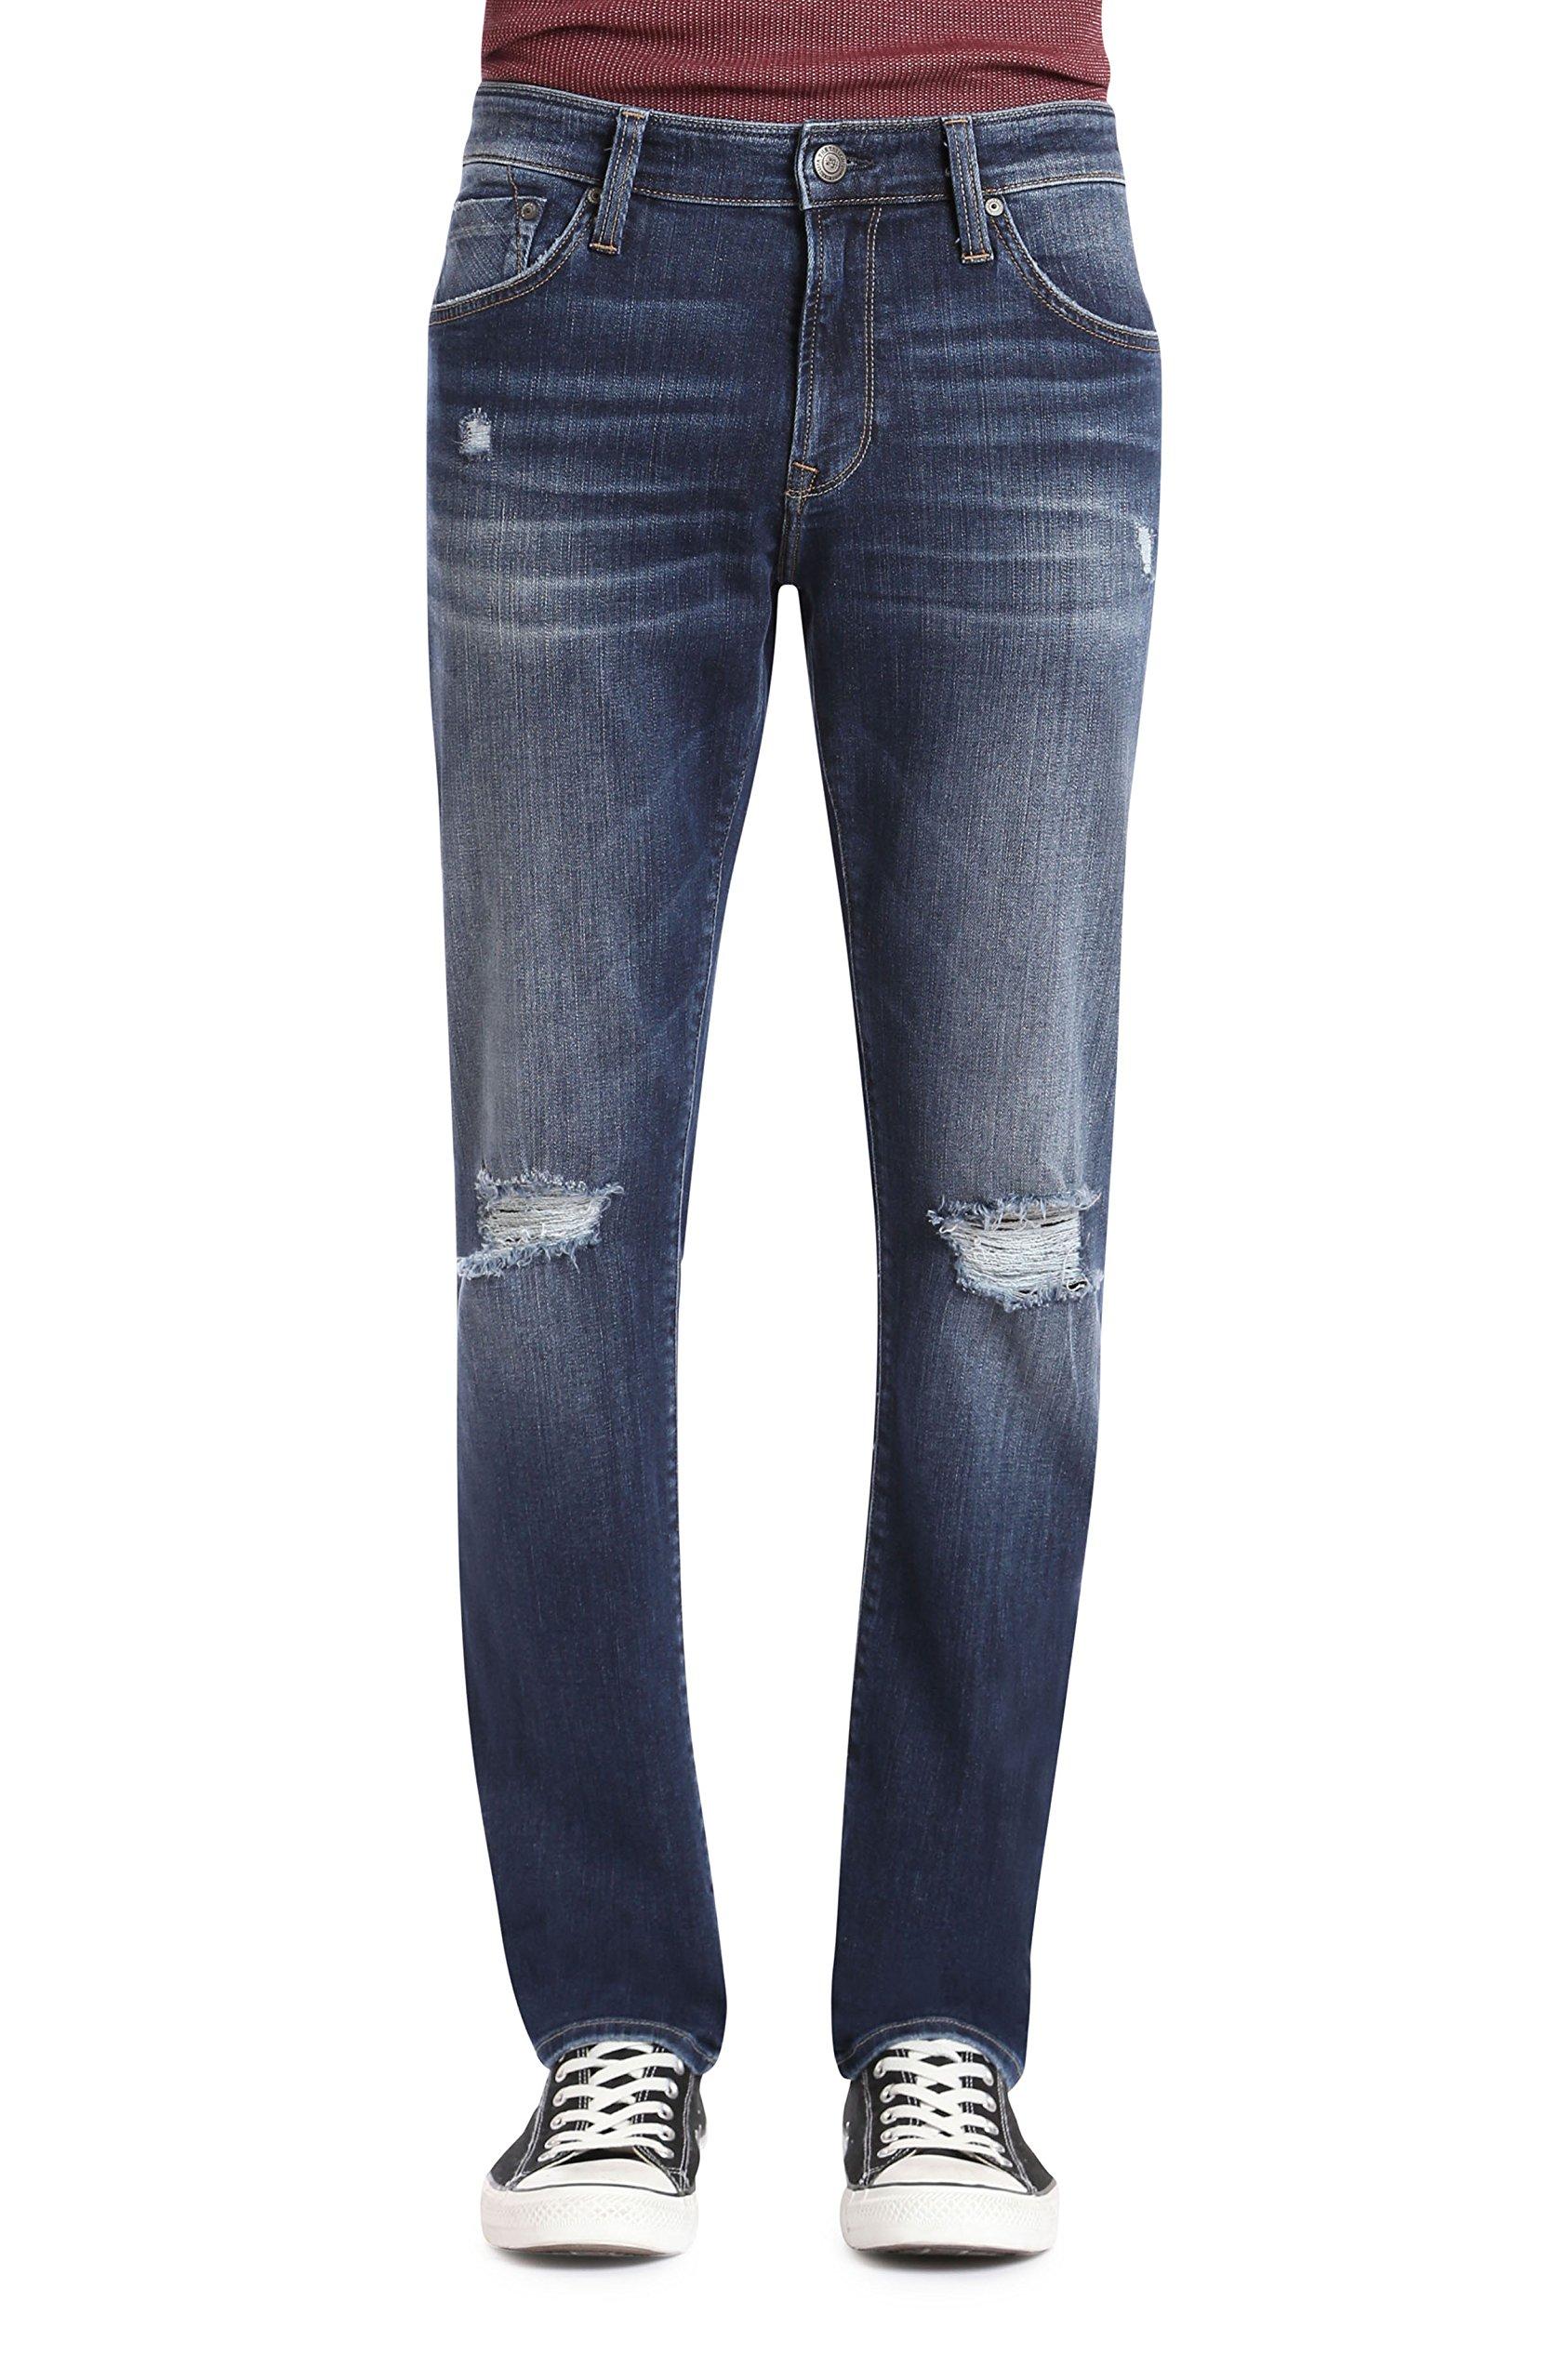 Mavi Men's Jake Regular-Rise Tapered Slim Fit Jeans, Deep Rip&used Authentic Vintage, 36W x 32L